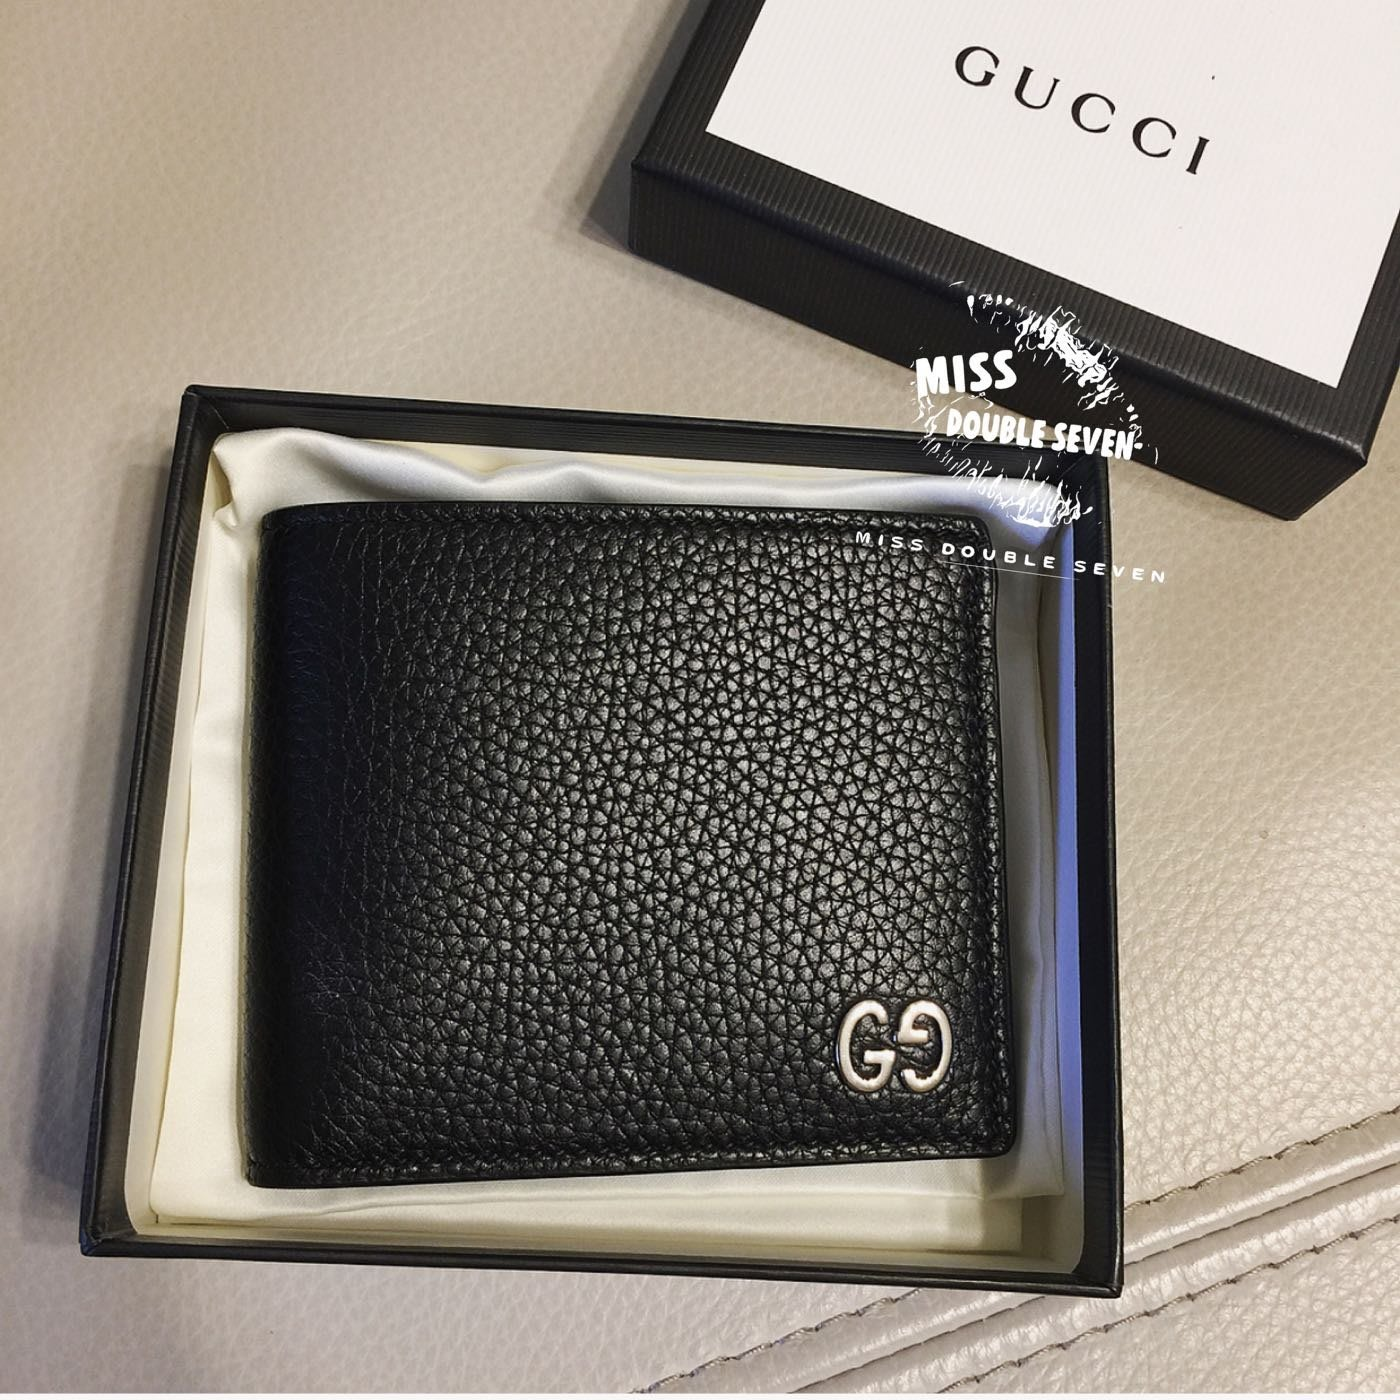 best website 142bc 2f6d4 Gucci 皮夾男夾短夾Leather Wallet 真皮簡約logo短夾| Yahoo奇摩拍賣